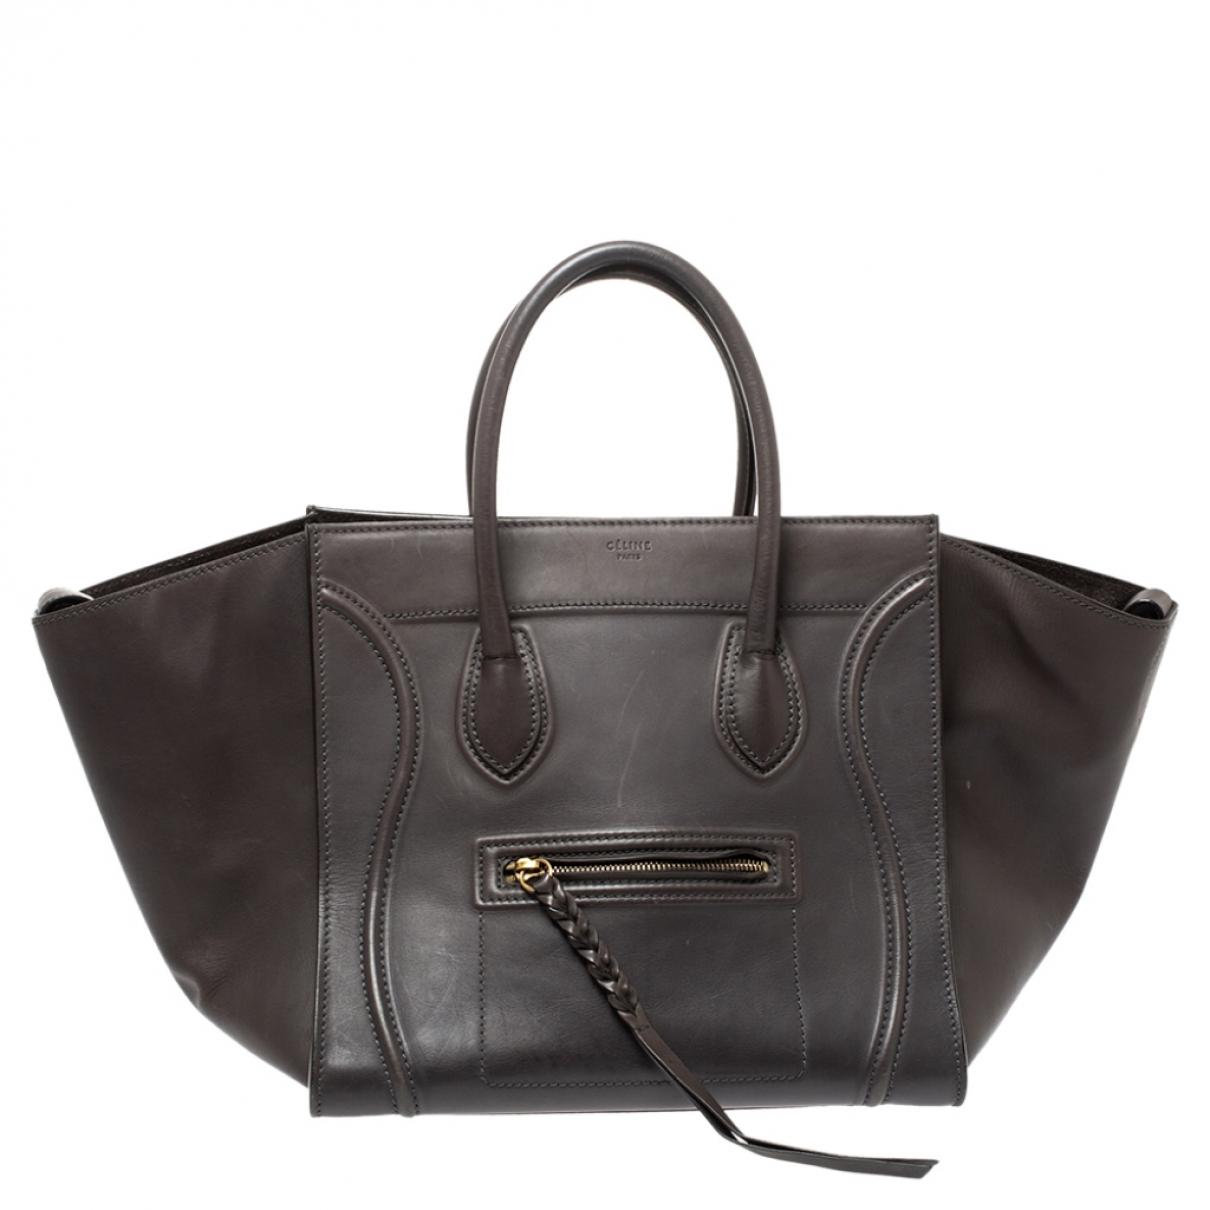 Celine Luggage Phantom Grey Leather handbag for Women N